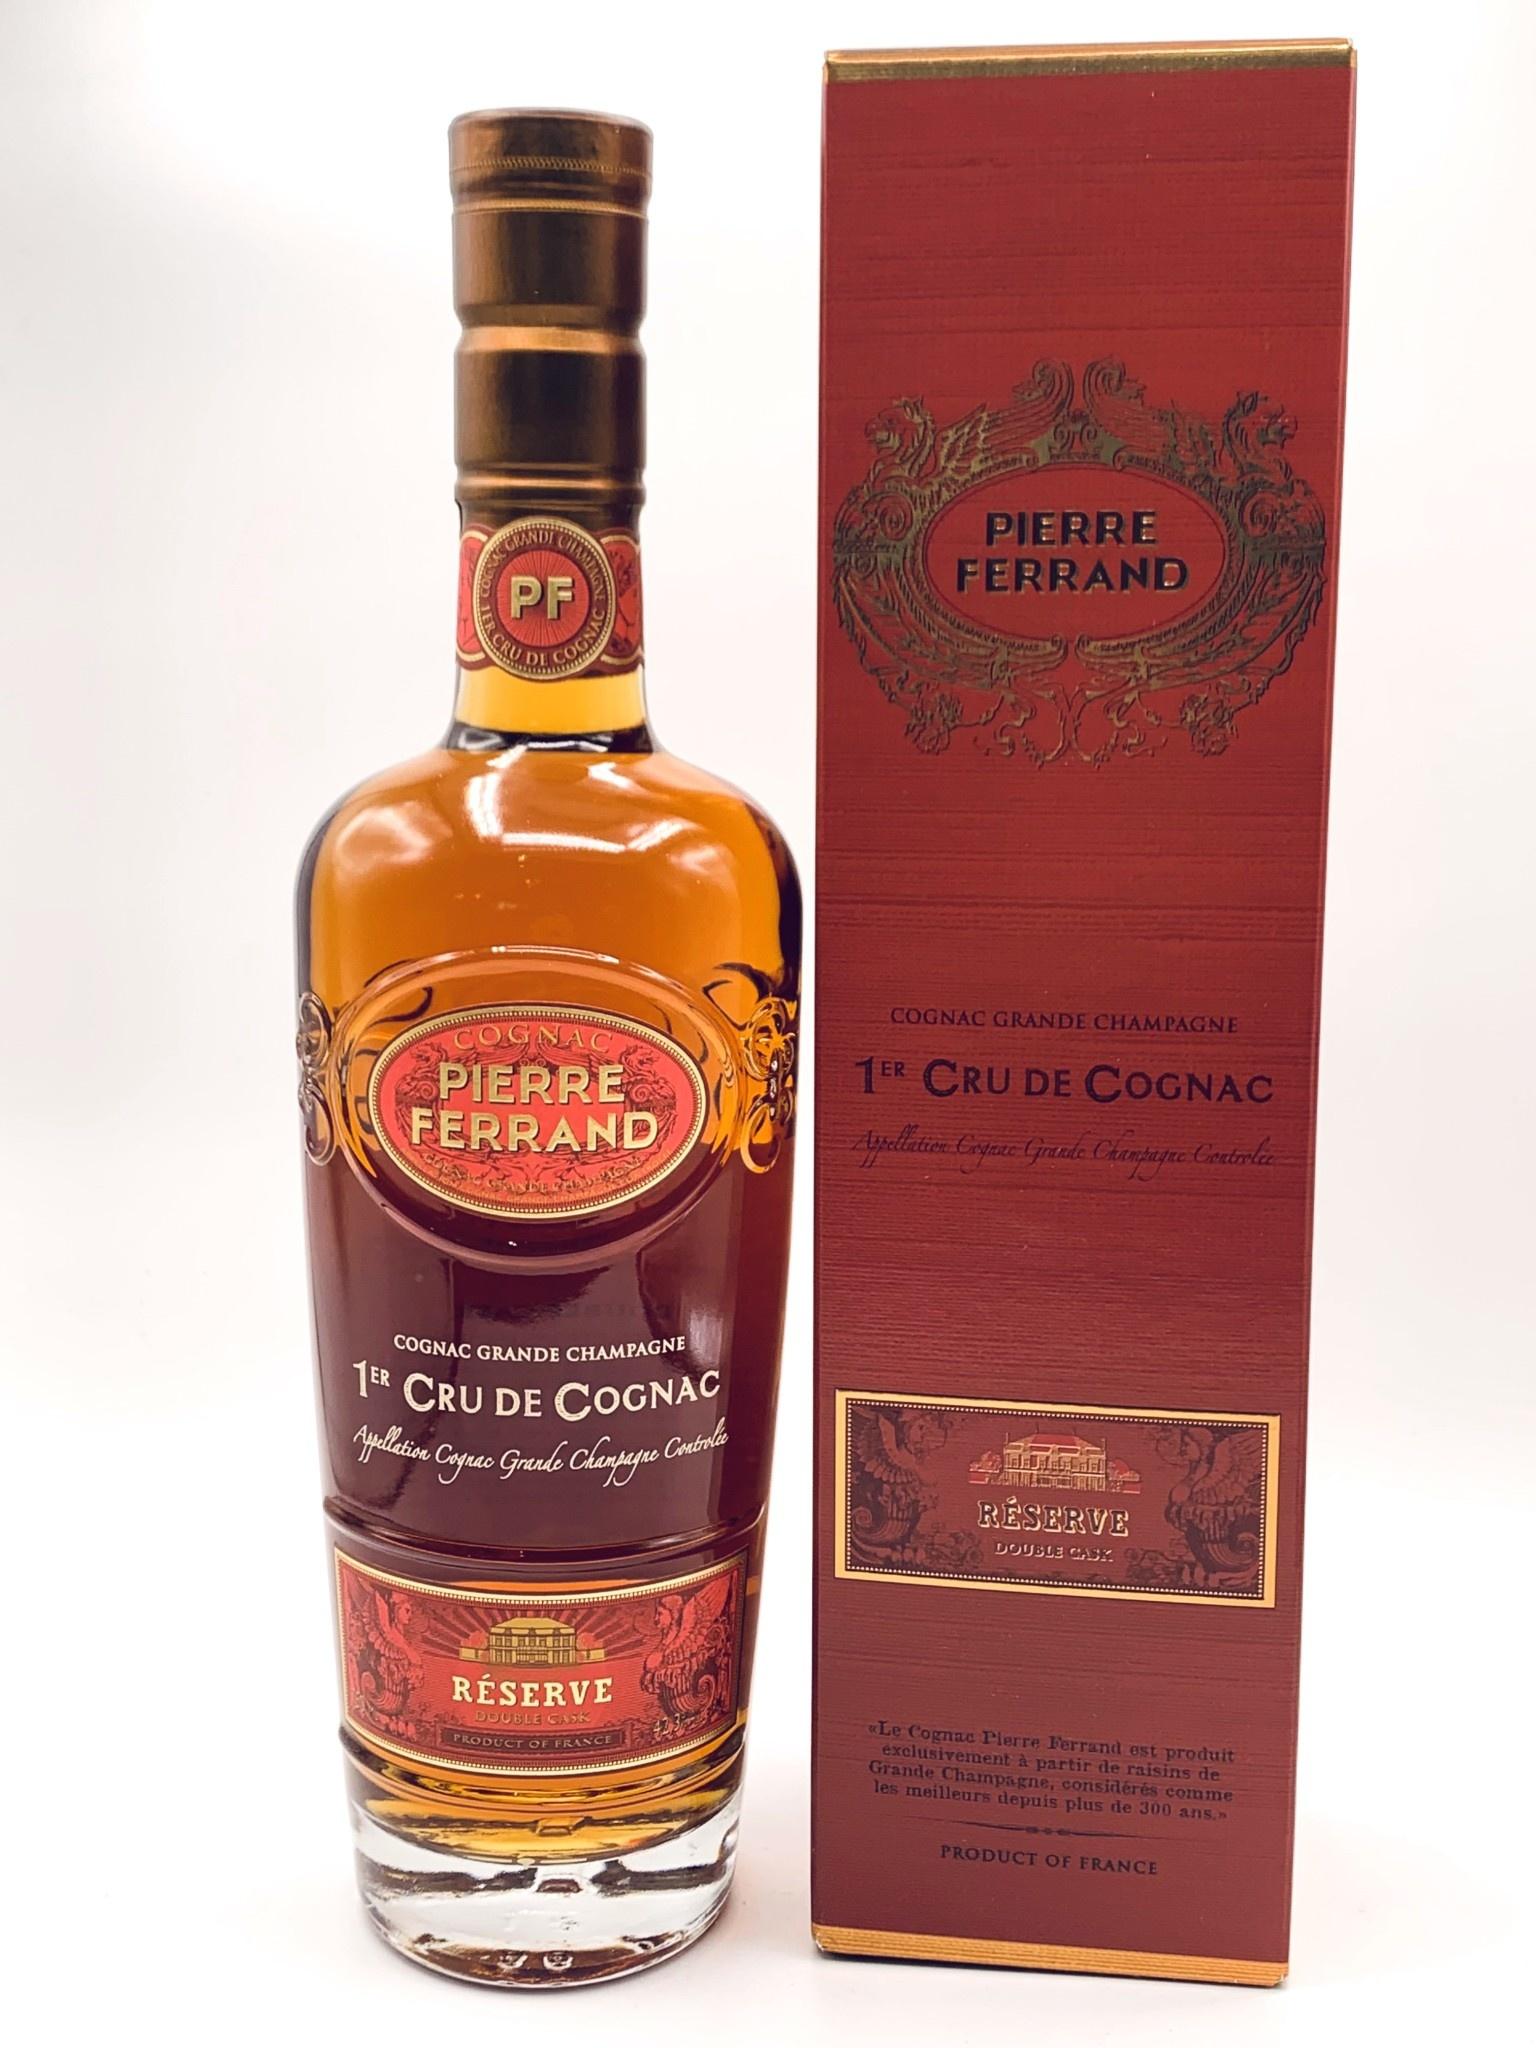 Pierre Ferrand Cognac 12yr Reserve Double Cask Grande Champagne 750ml (80 Proof)